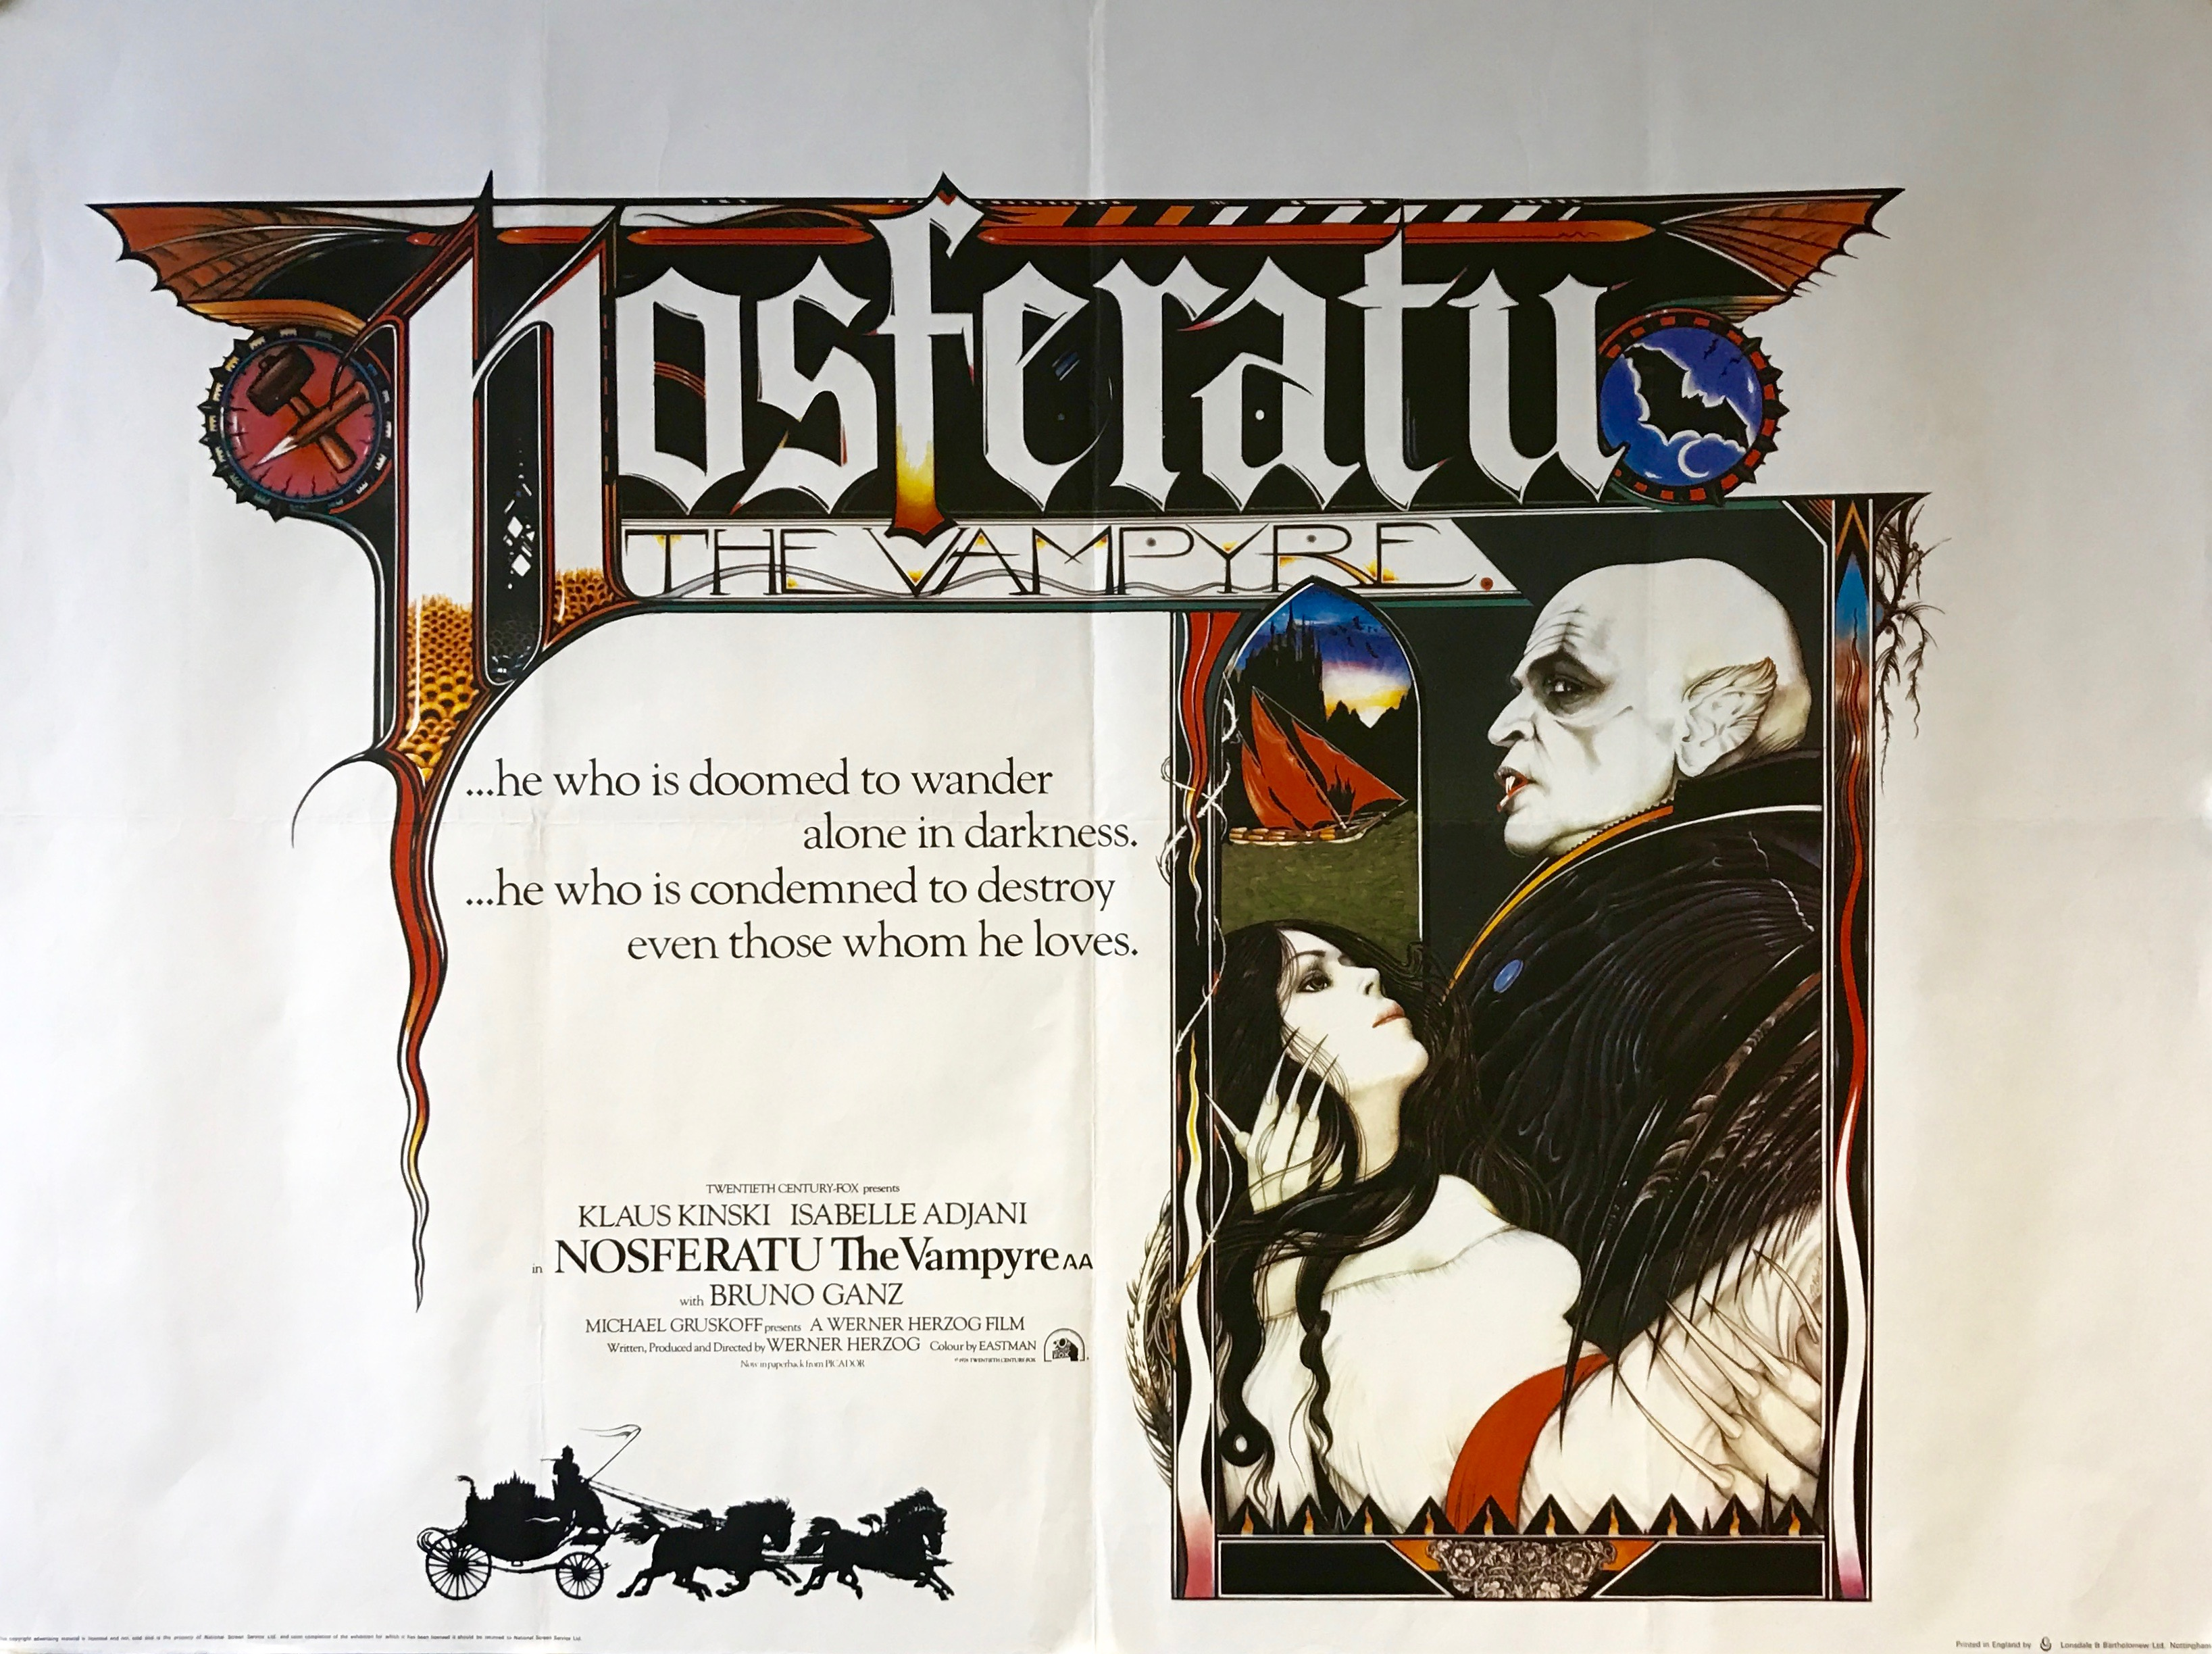 Nosferatu The Vampyre - Vintage Movie Posters